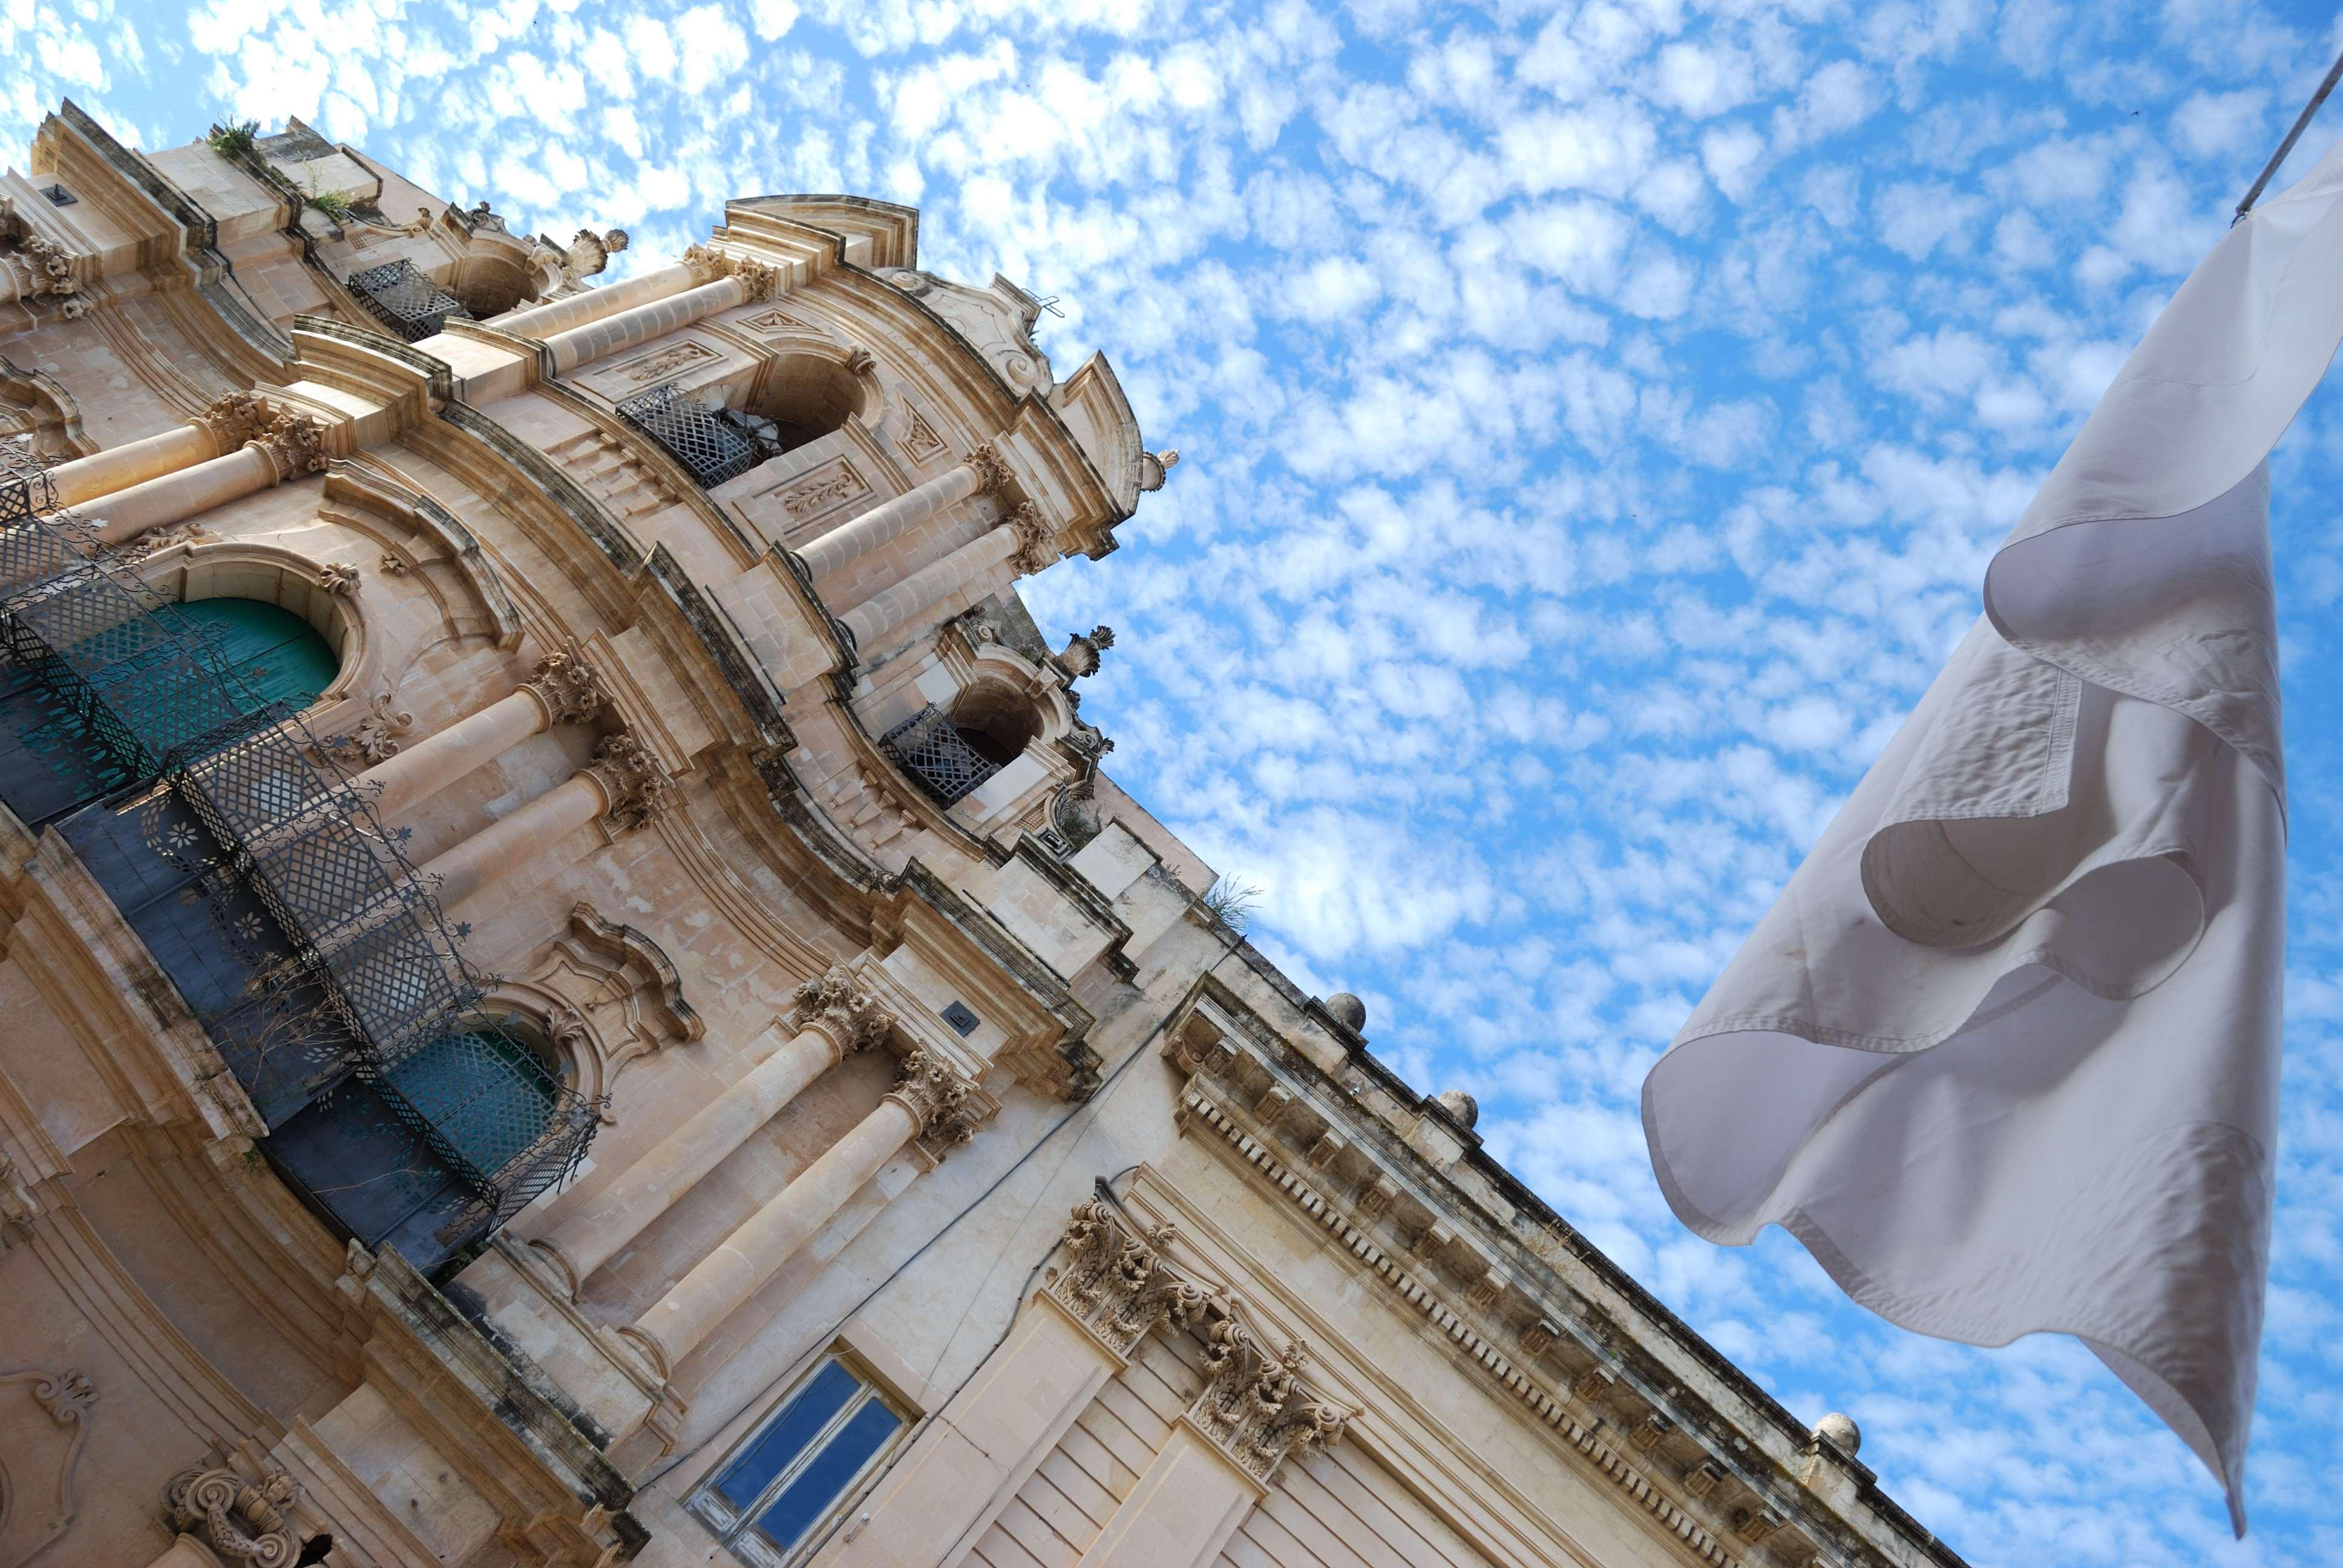 Chiesa di San Giovanni Evangelista_bandiera Bianca di Regina José Galindo & David Perez Karmadavis_Sasha Vinci